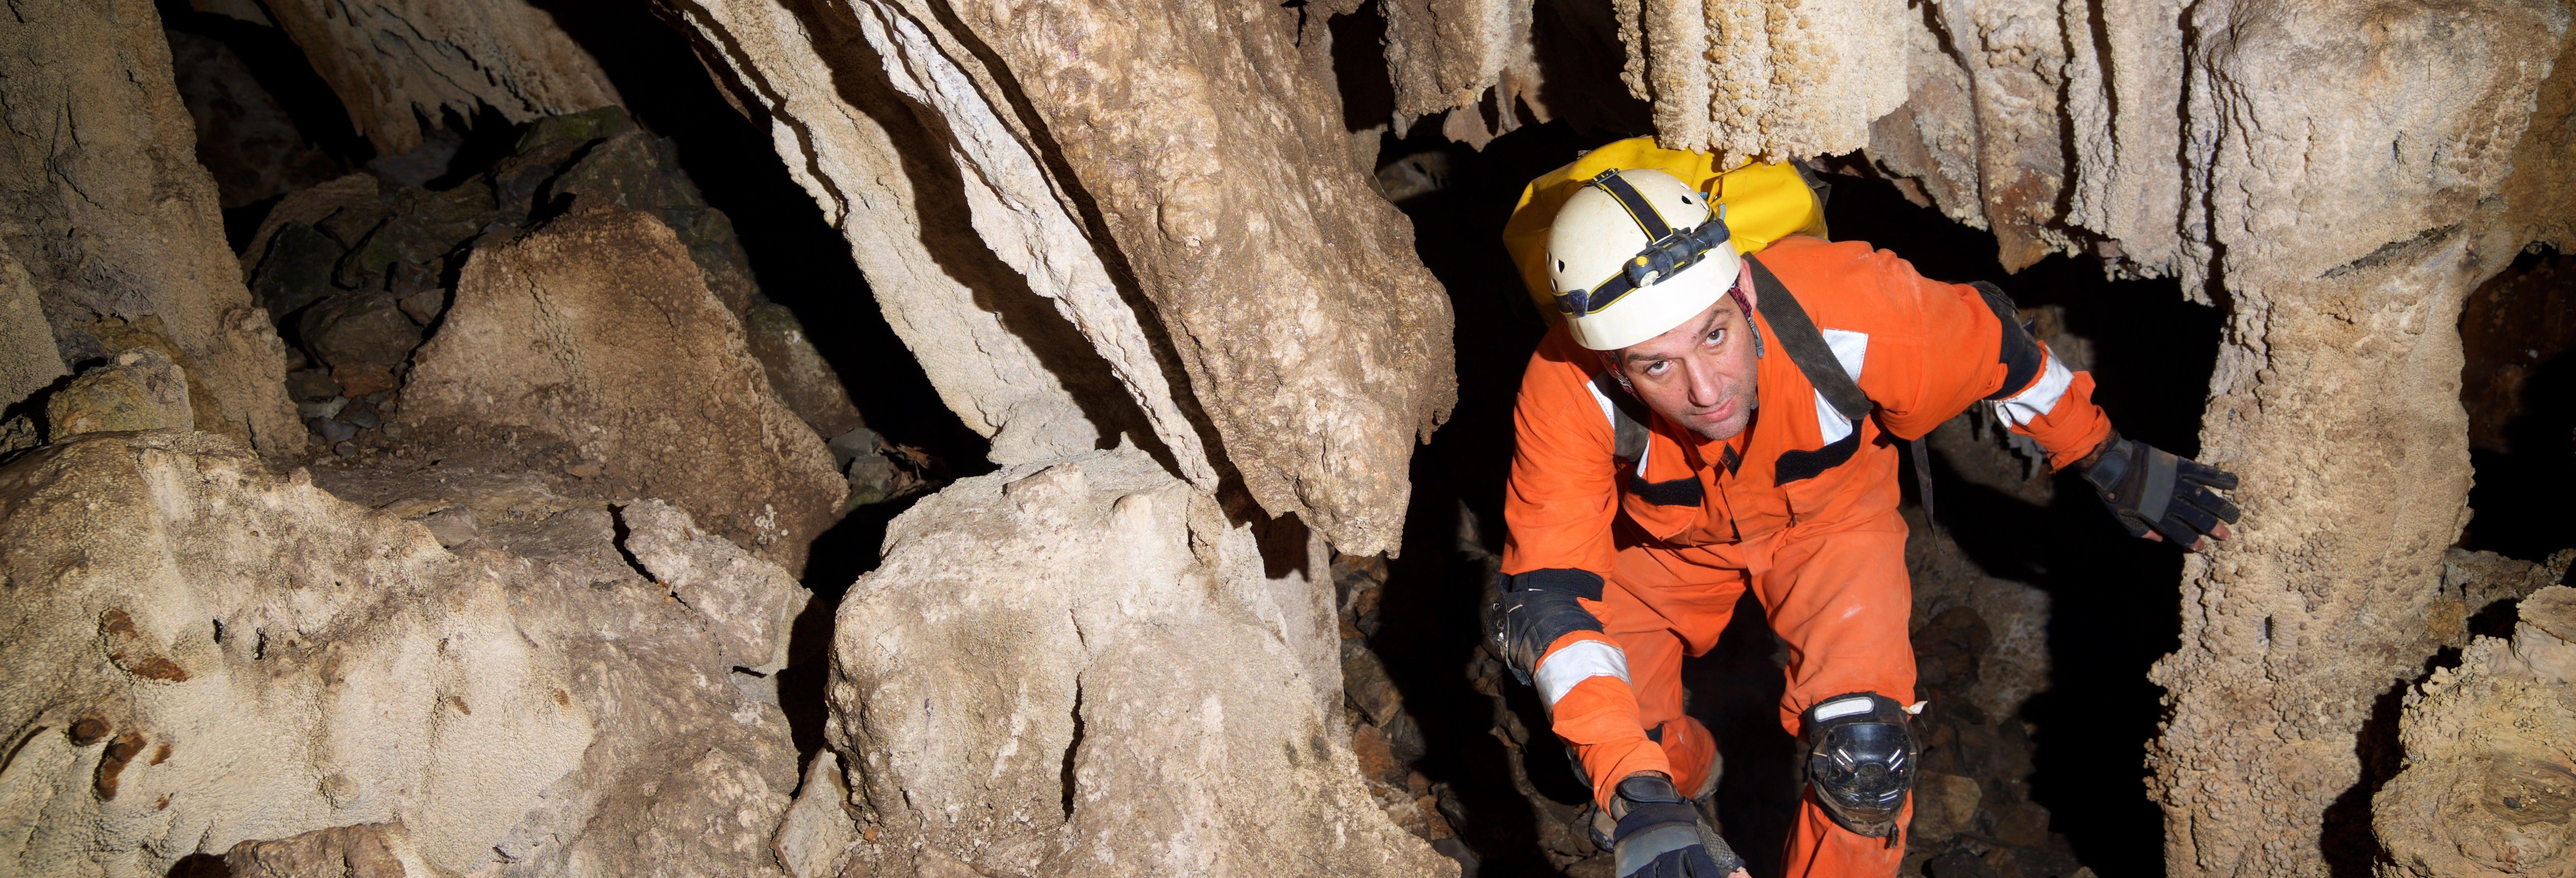 Cueva de la Plata Caving Trip